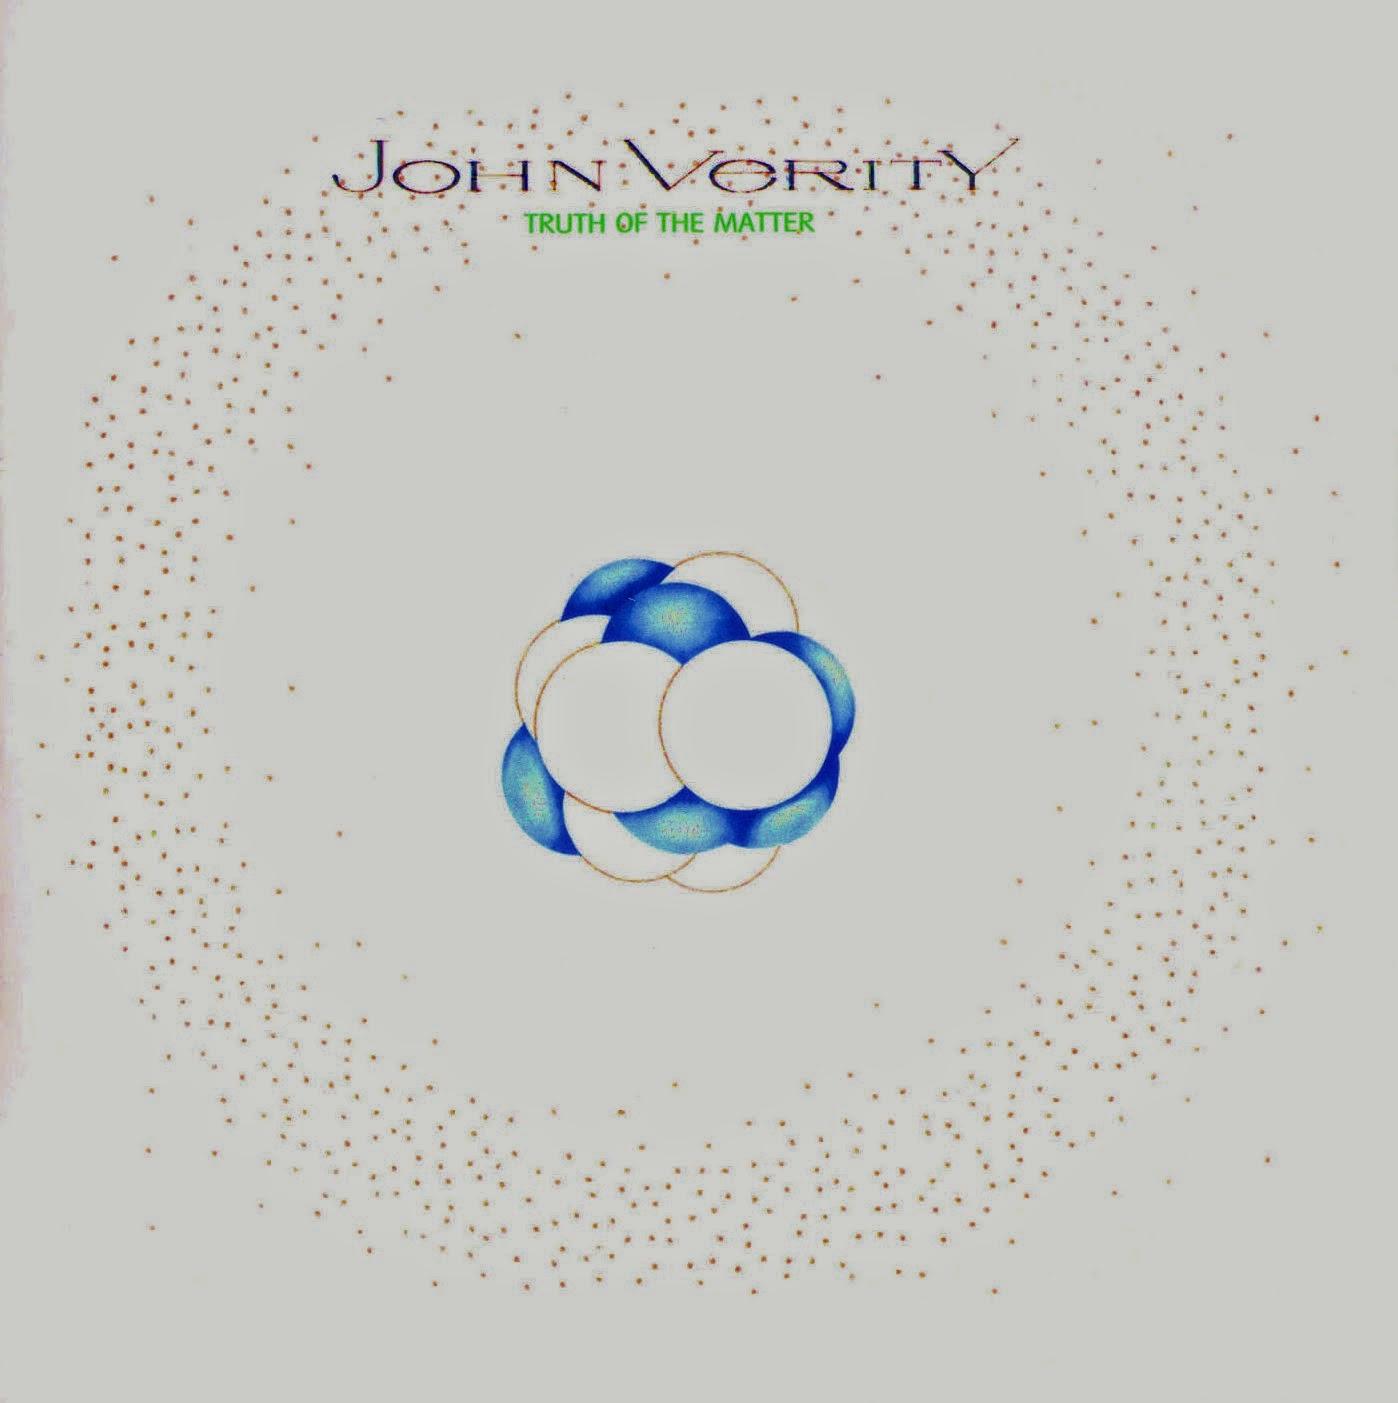 John Verity Truth of the matter 1985